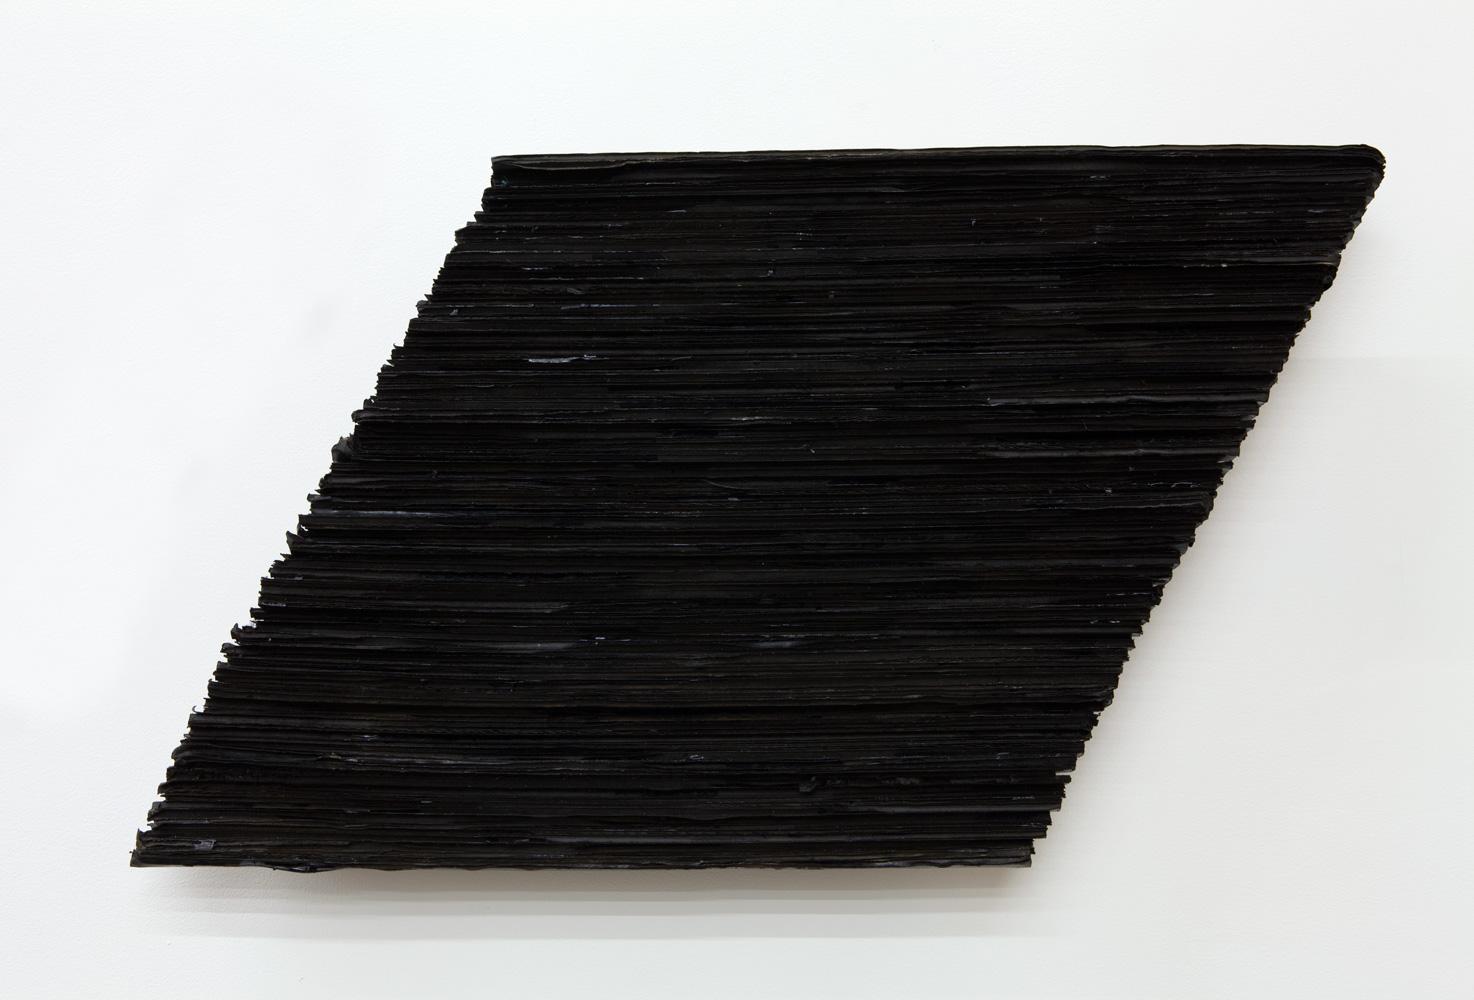 Accumulating Horizon , 1976 地状積 ( Chijōseki ) Cardboard, acrylic 17 3/8 x 30 5/16 x 3 1/2 inches 44 x 77 x 9 cm